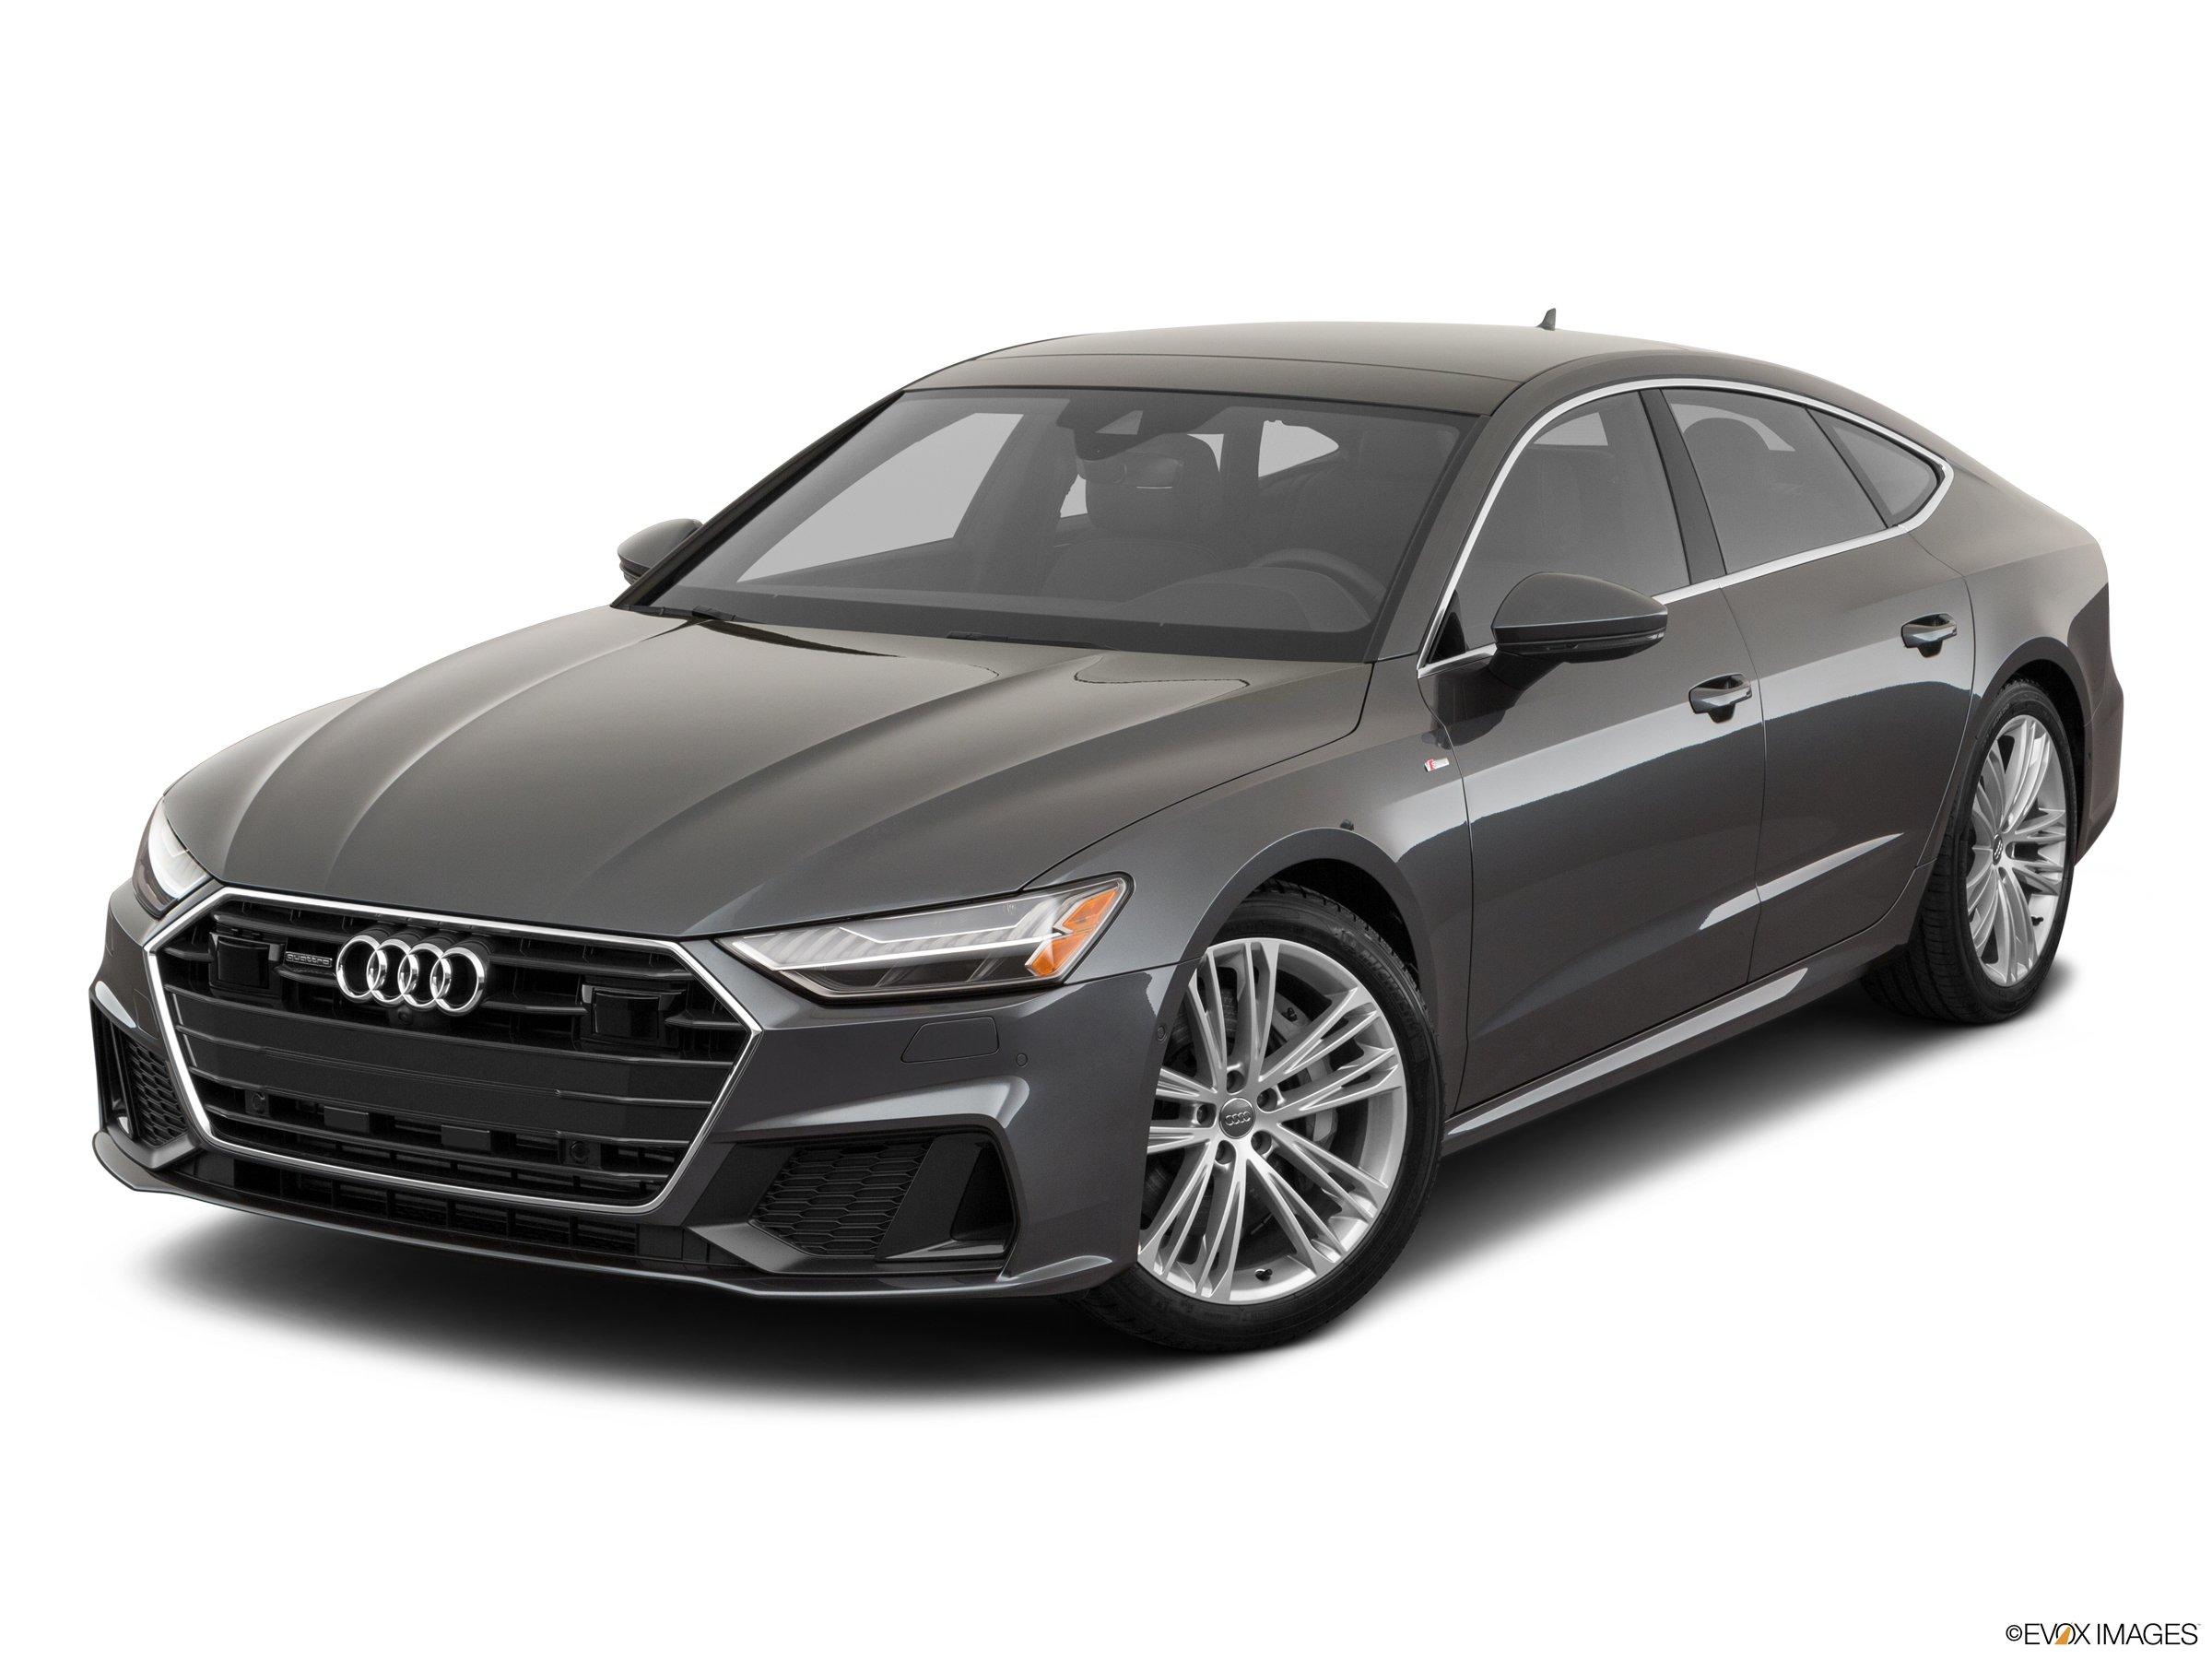 2020 Audi A7 Premium Plus 55 TFSI AWD sedan